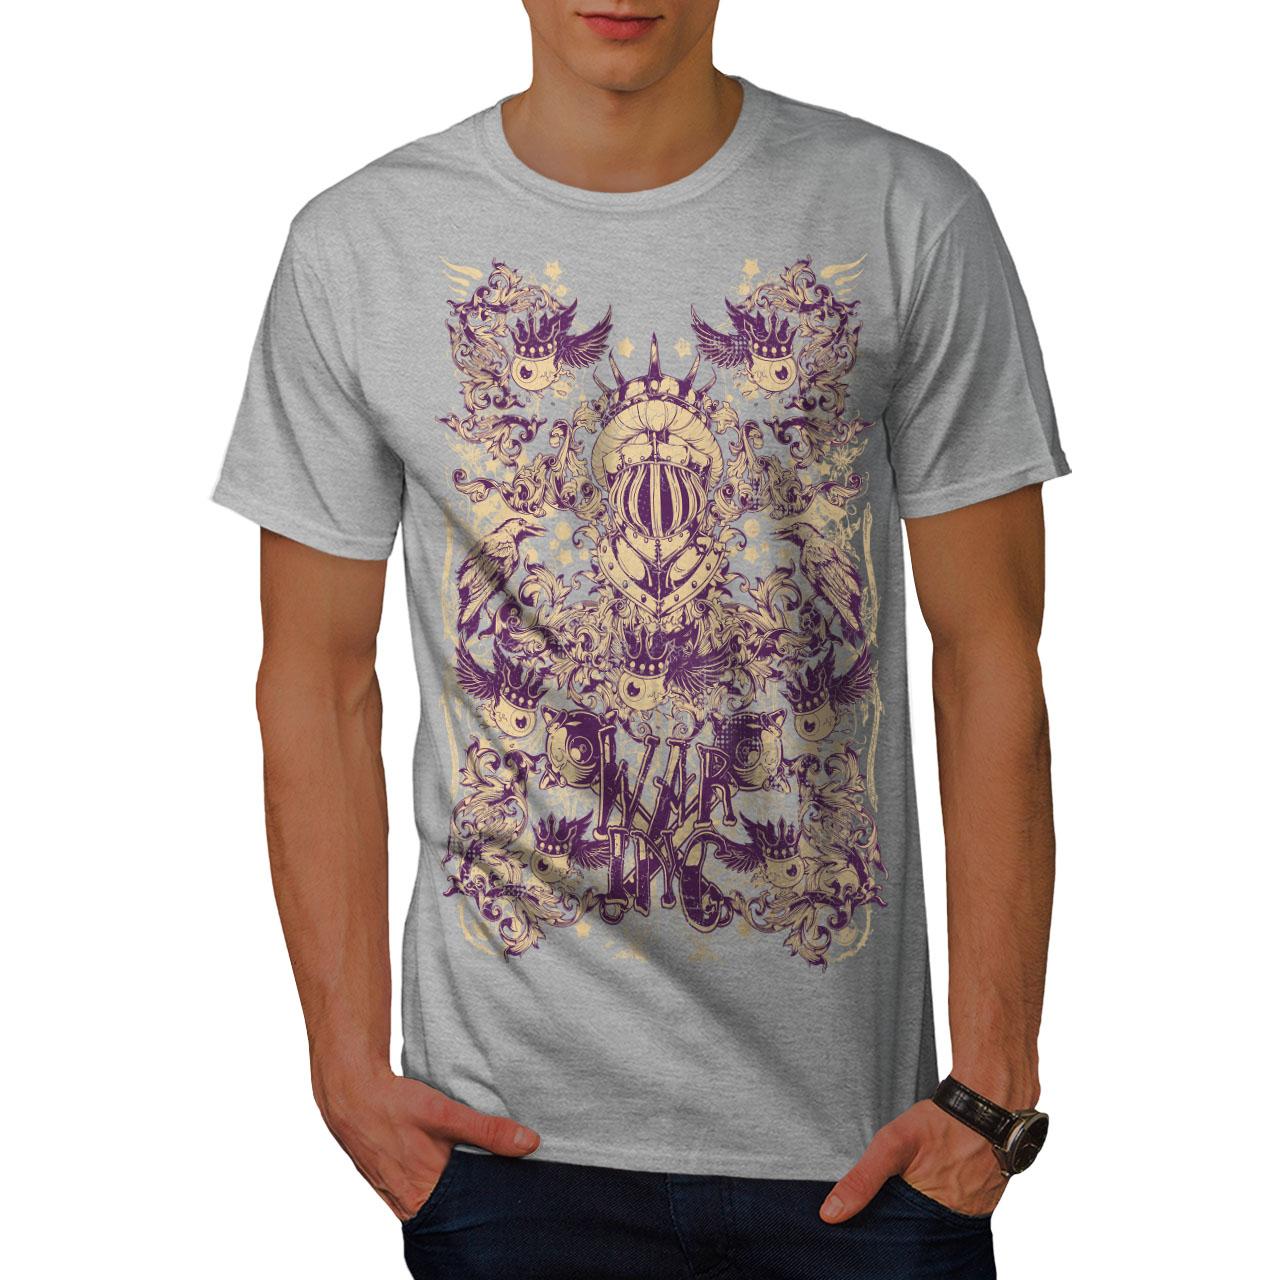 Wellcoda-War-Inc-Zombie-Mens-T-shirt-Monster-Graphic-Design-Printed-Tee thumbnail 15